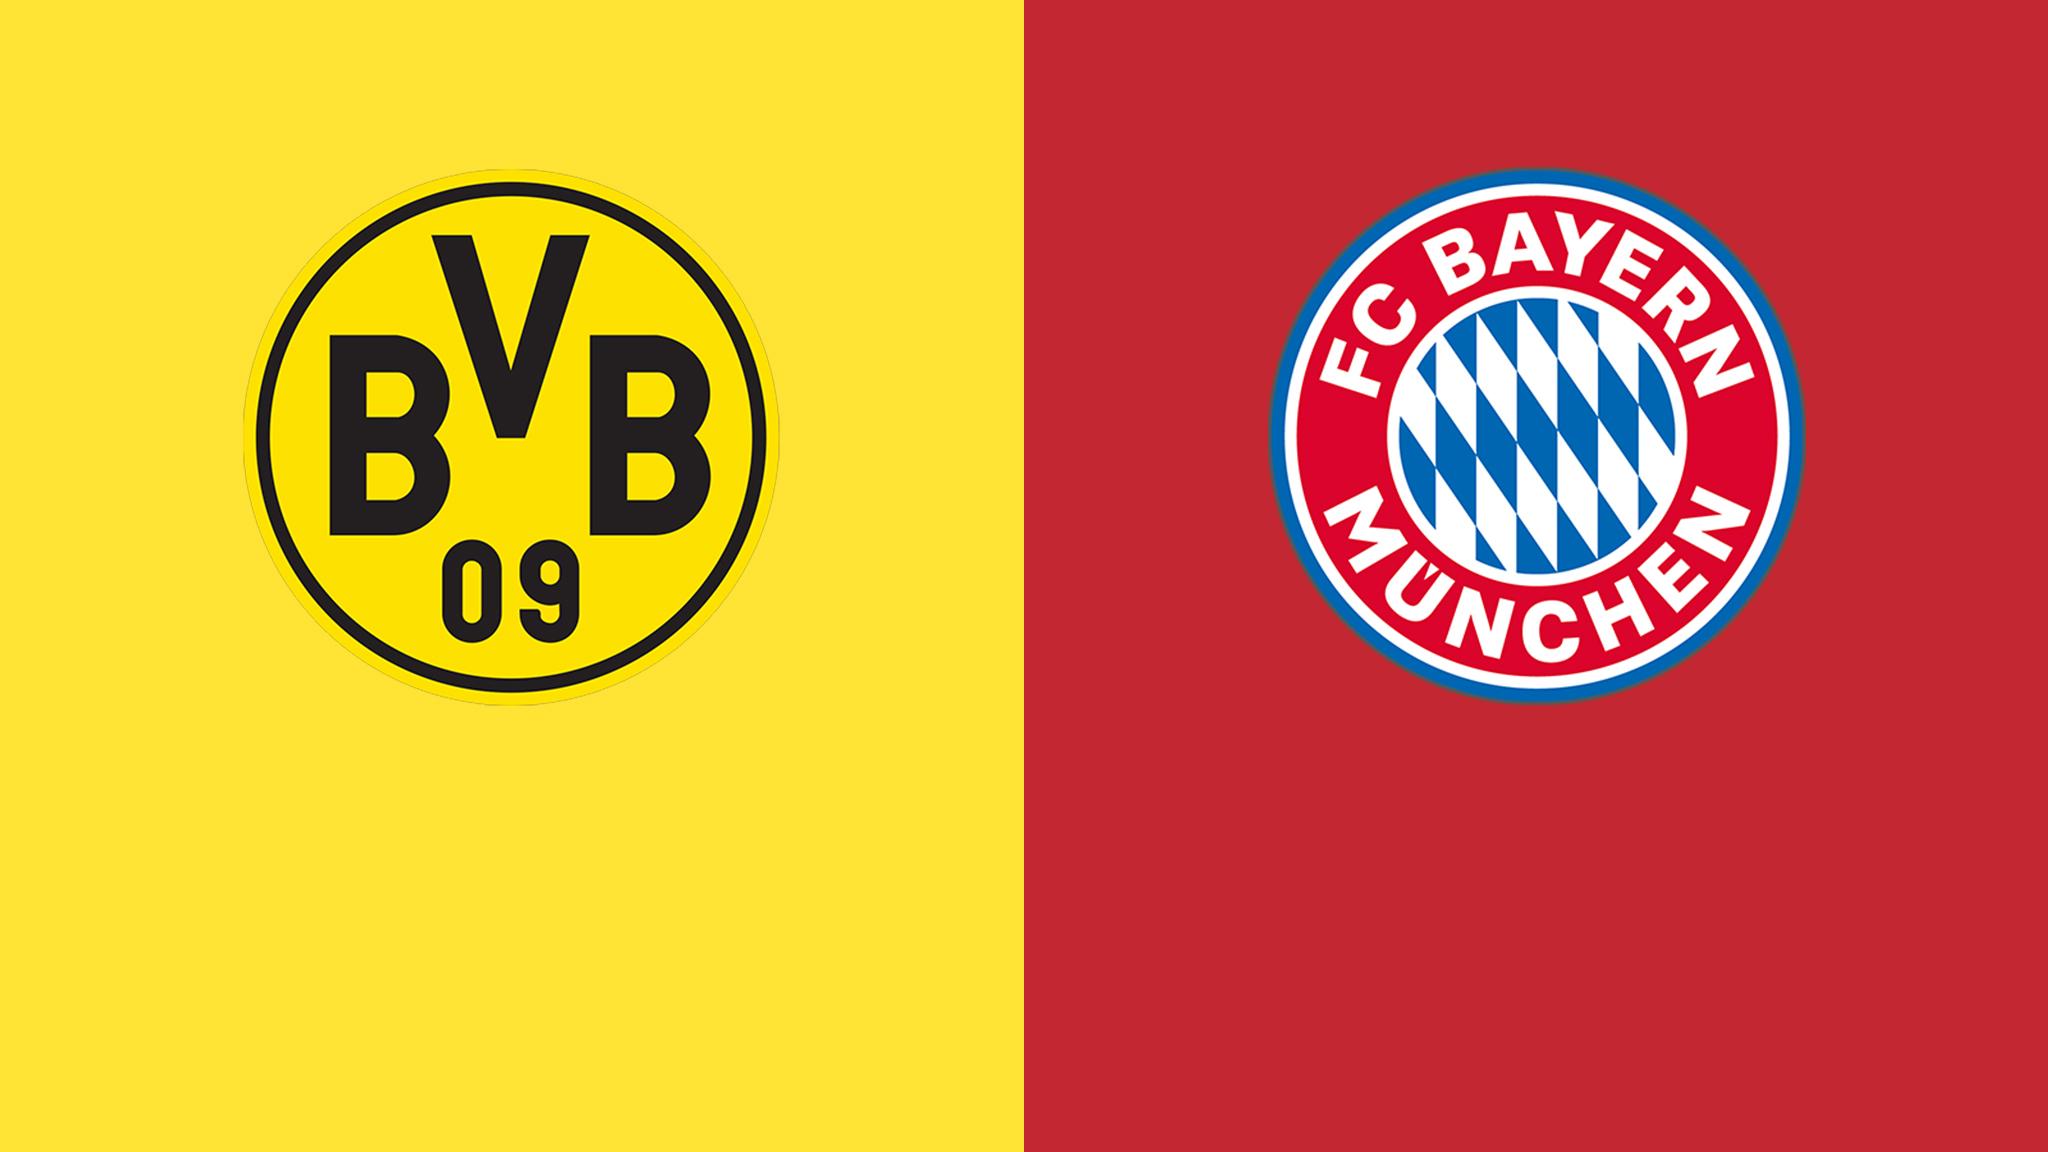 Borussia Dortmund vs Bayern Munich German Bundesliga